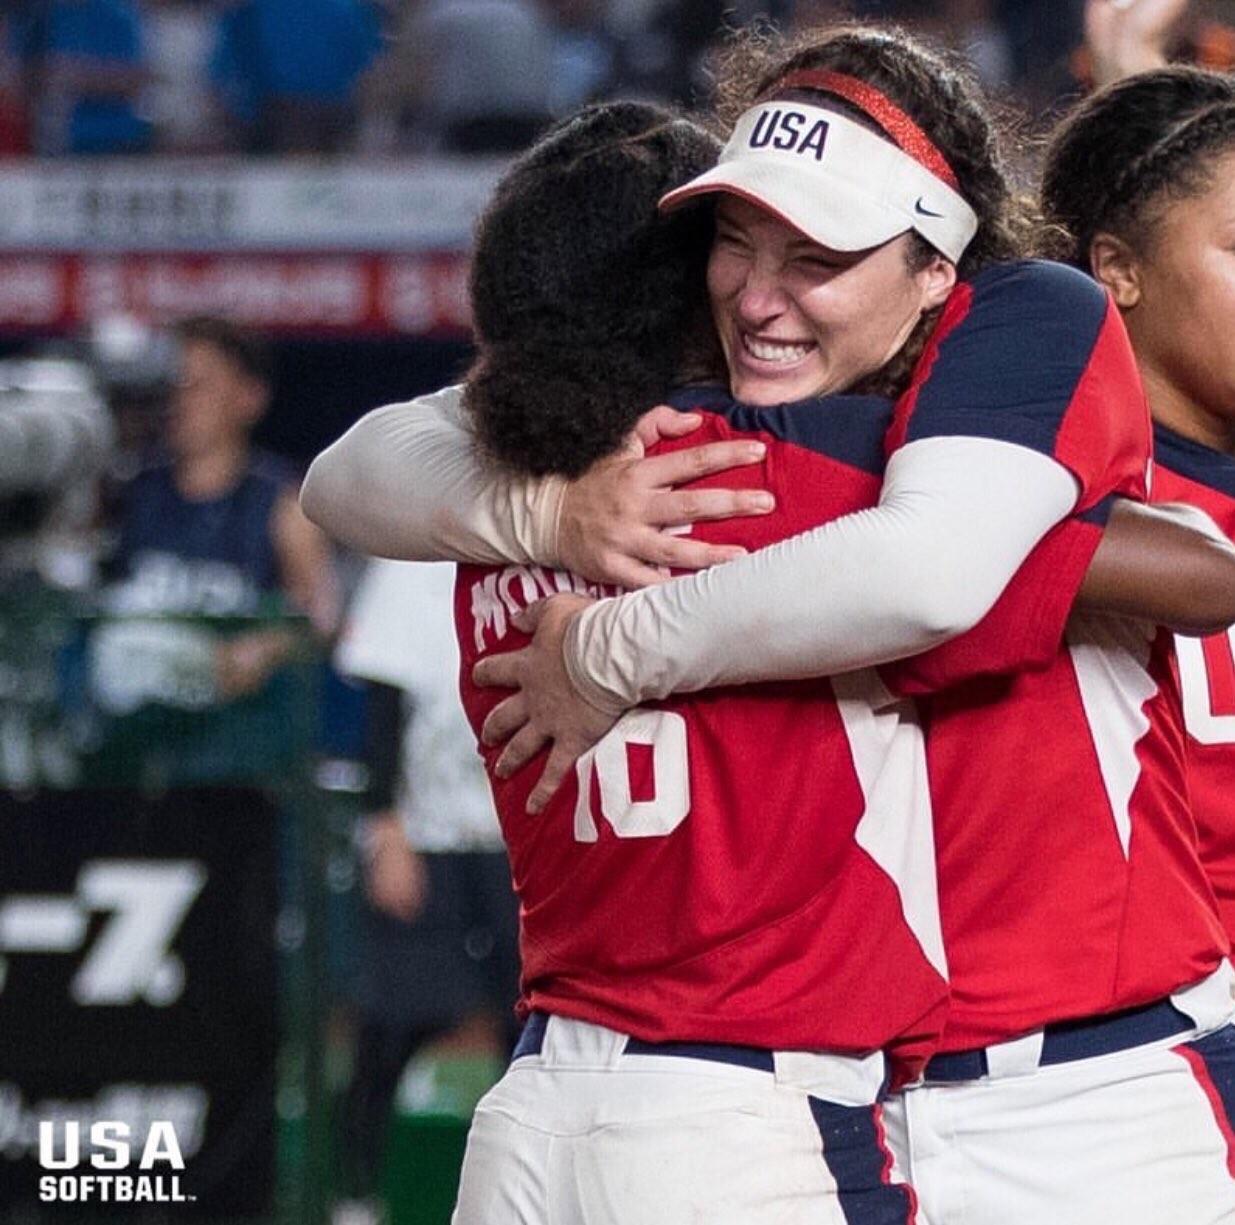 Valarie Arioto and teammate hugging